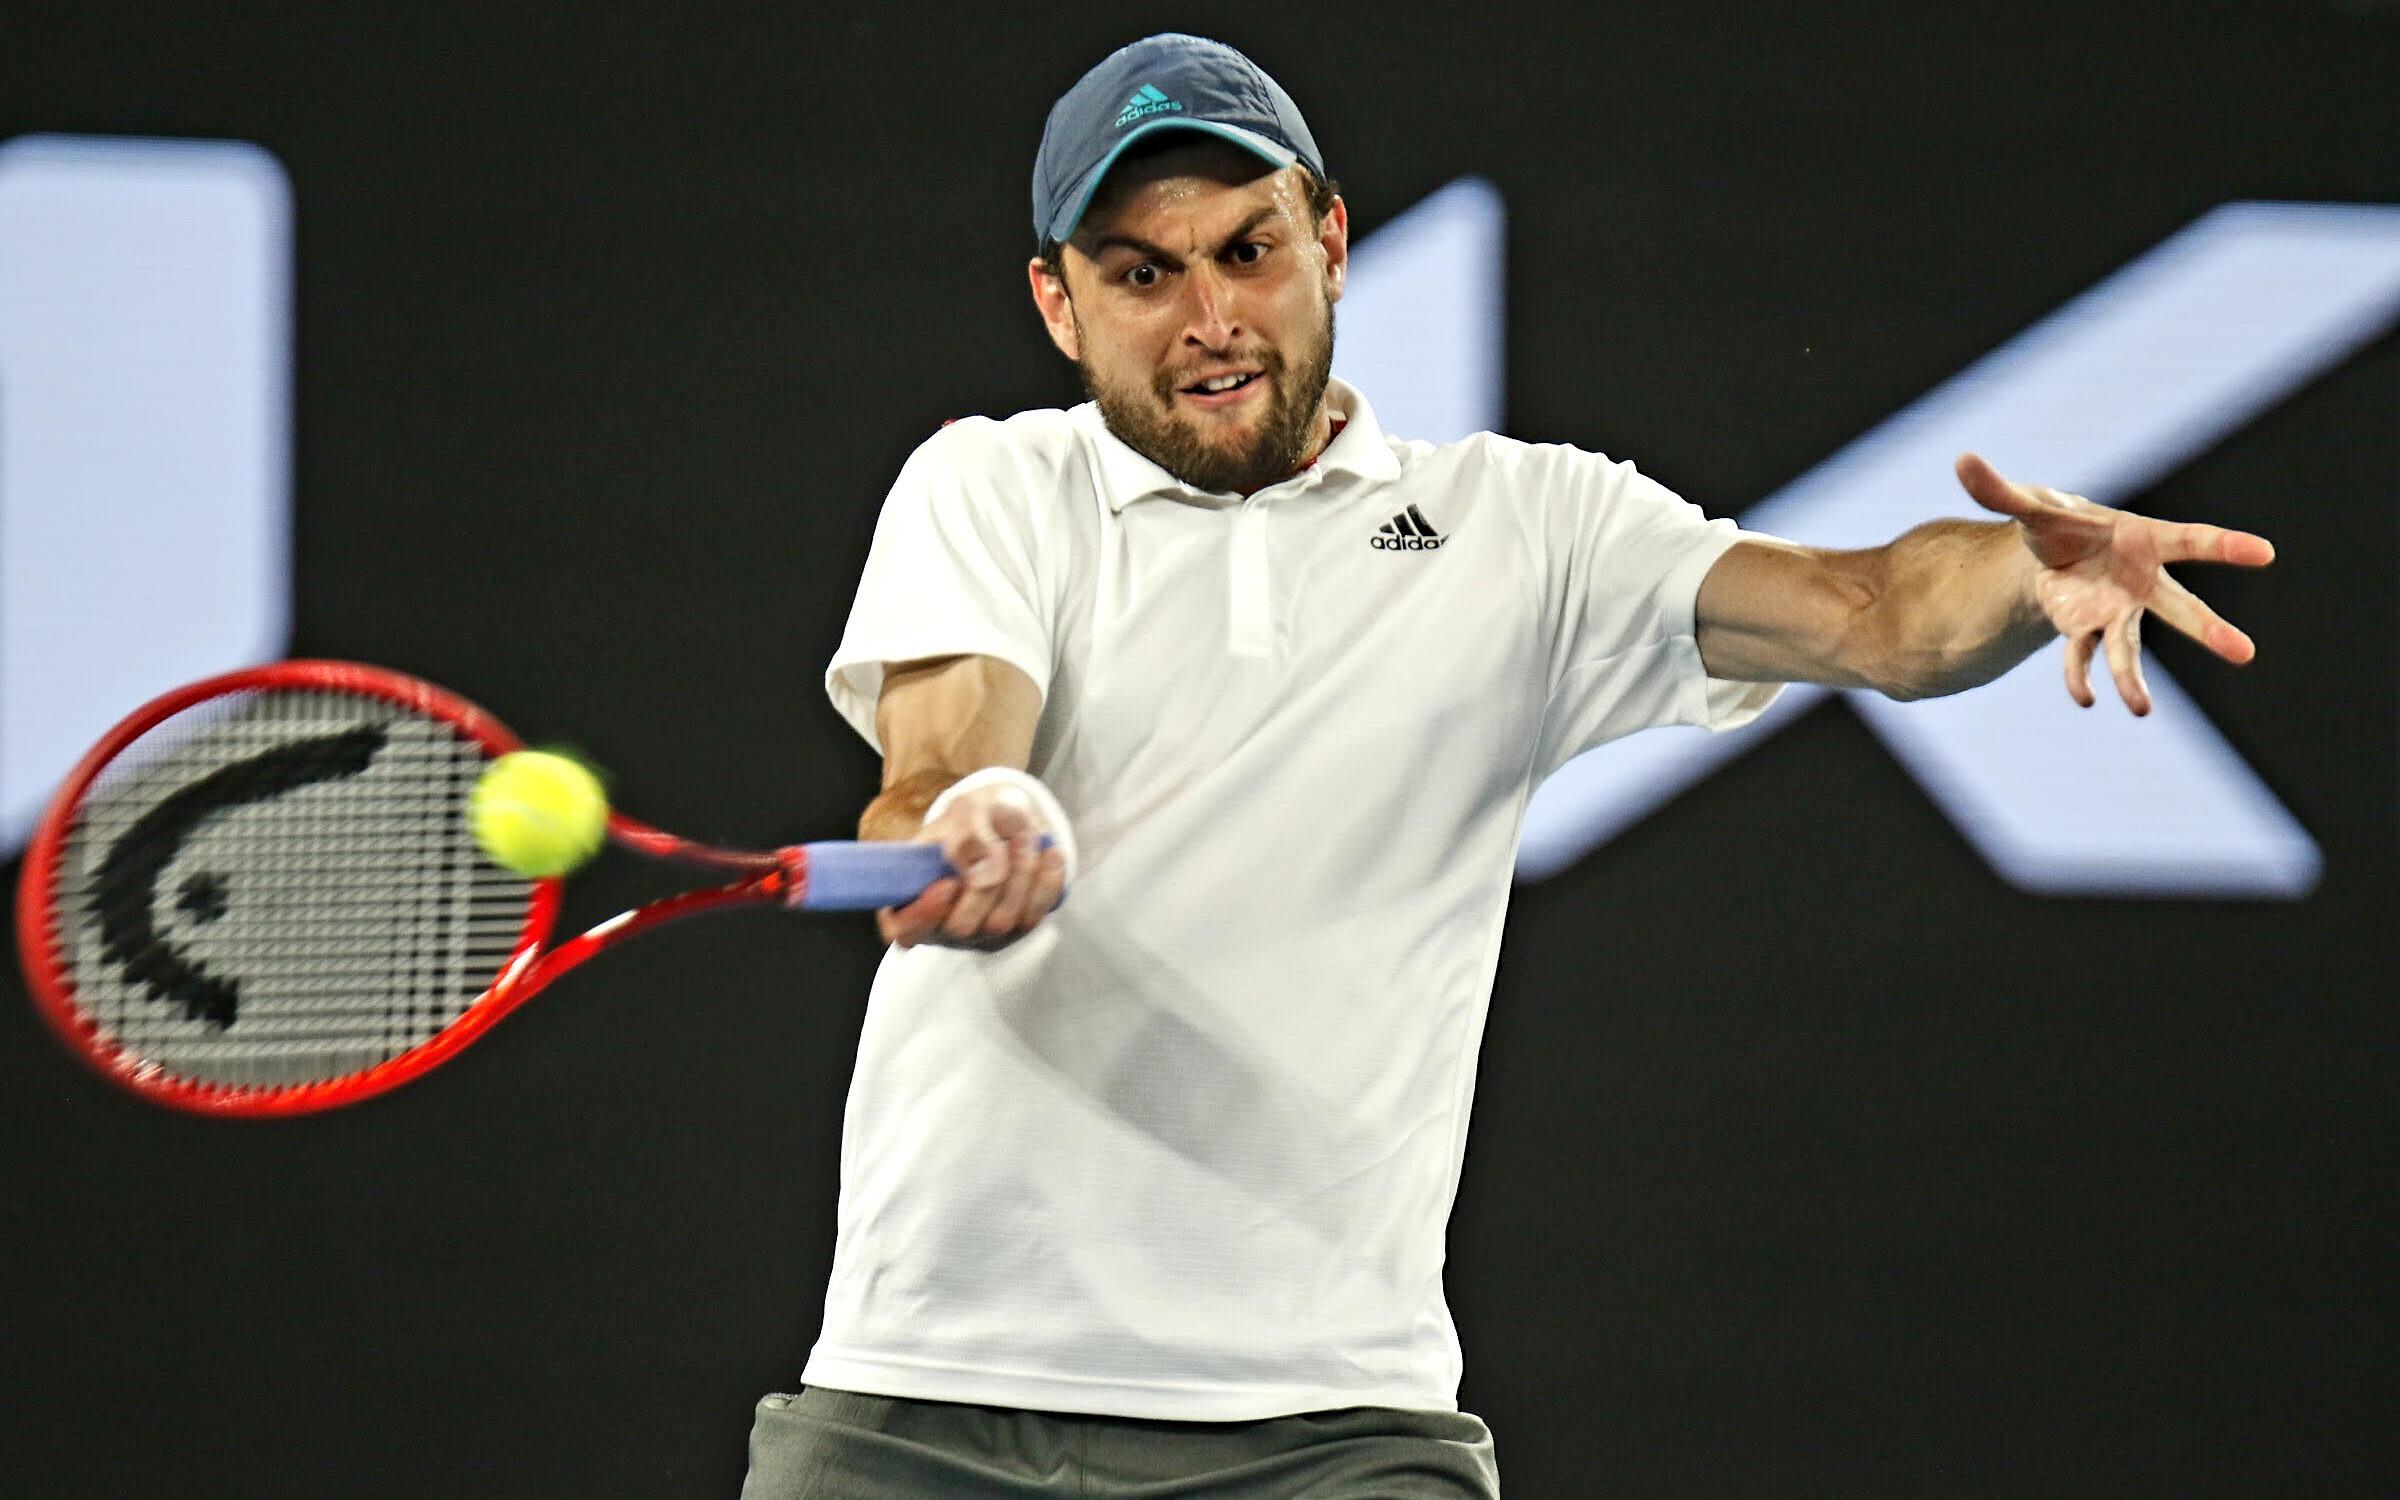 Russian-Israeli tennis player Aslan Karatsev wins Dubai open, his first  title